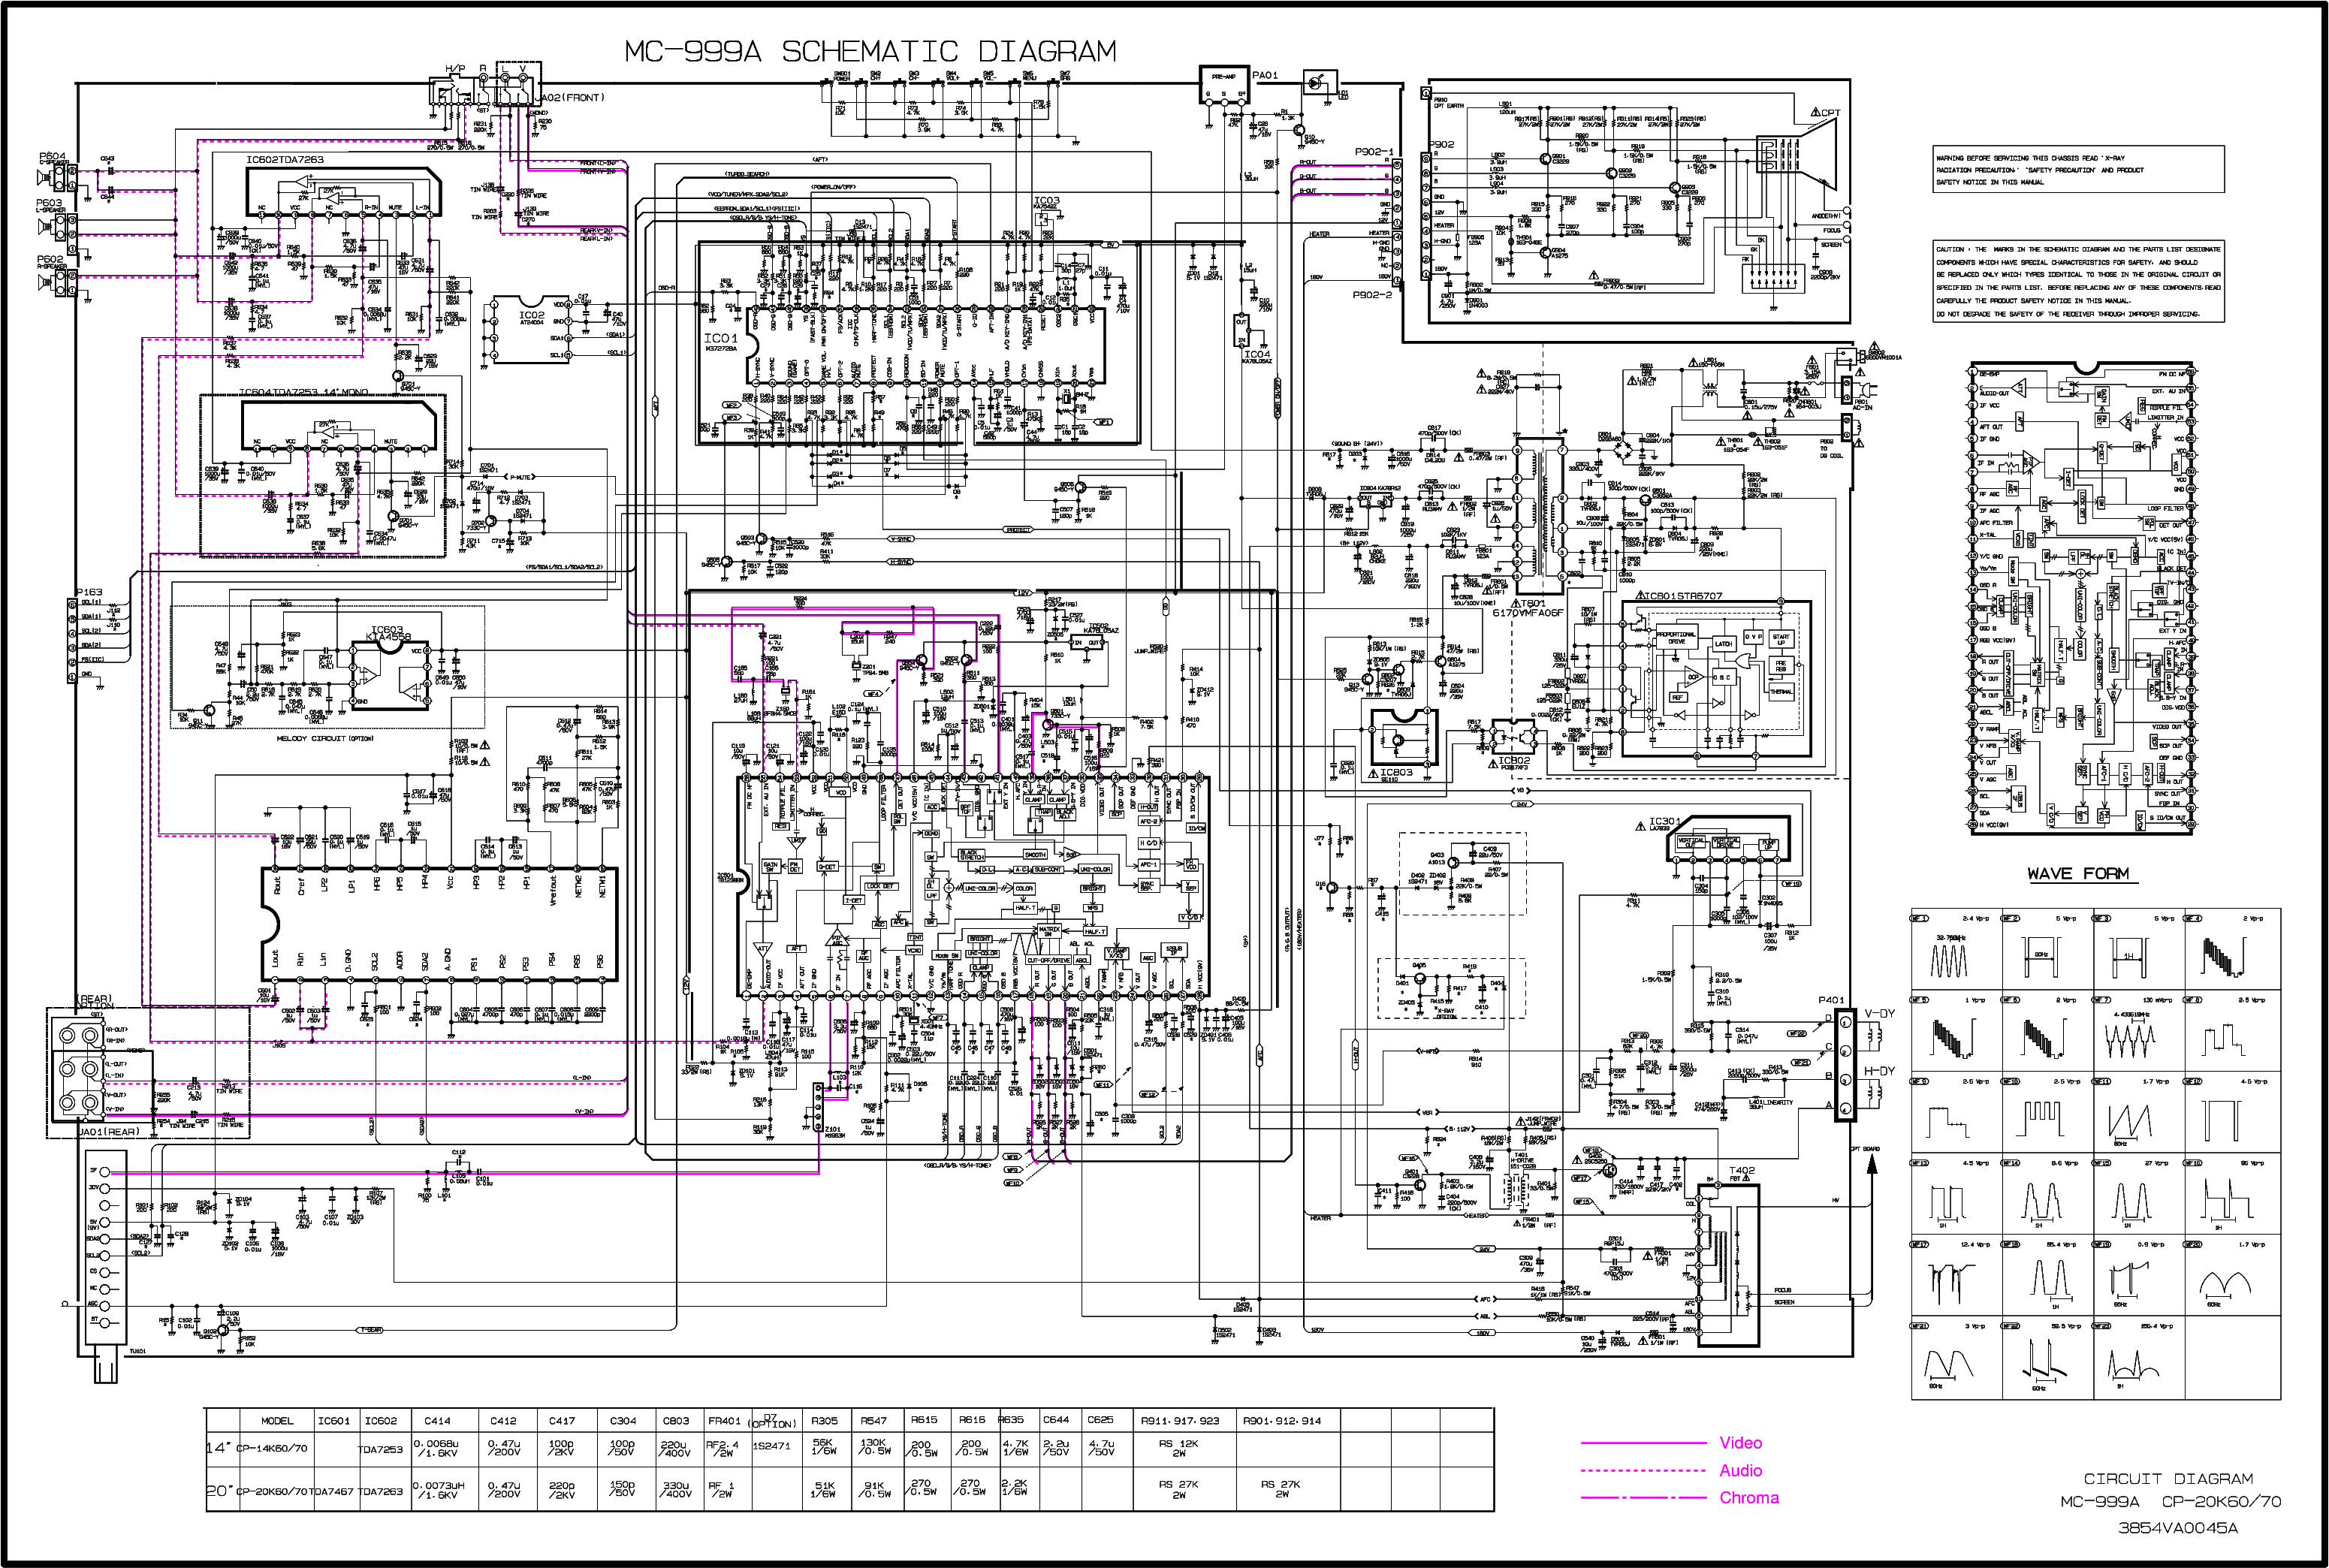 lg cp20k70 mc999a sch service manual download  schematics  eeprom  repair info for electronics